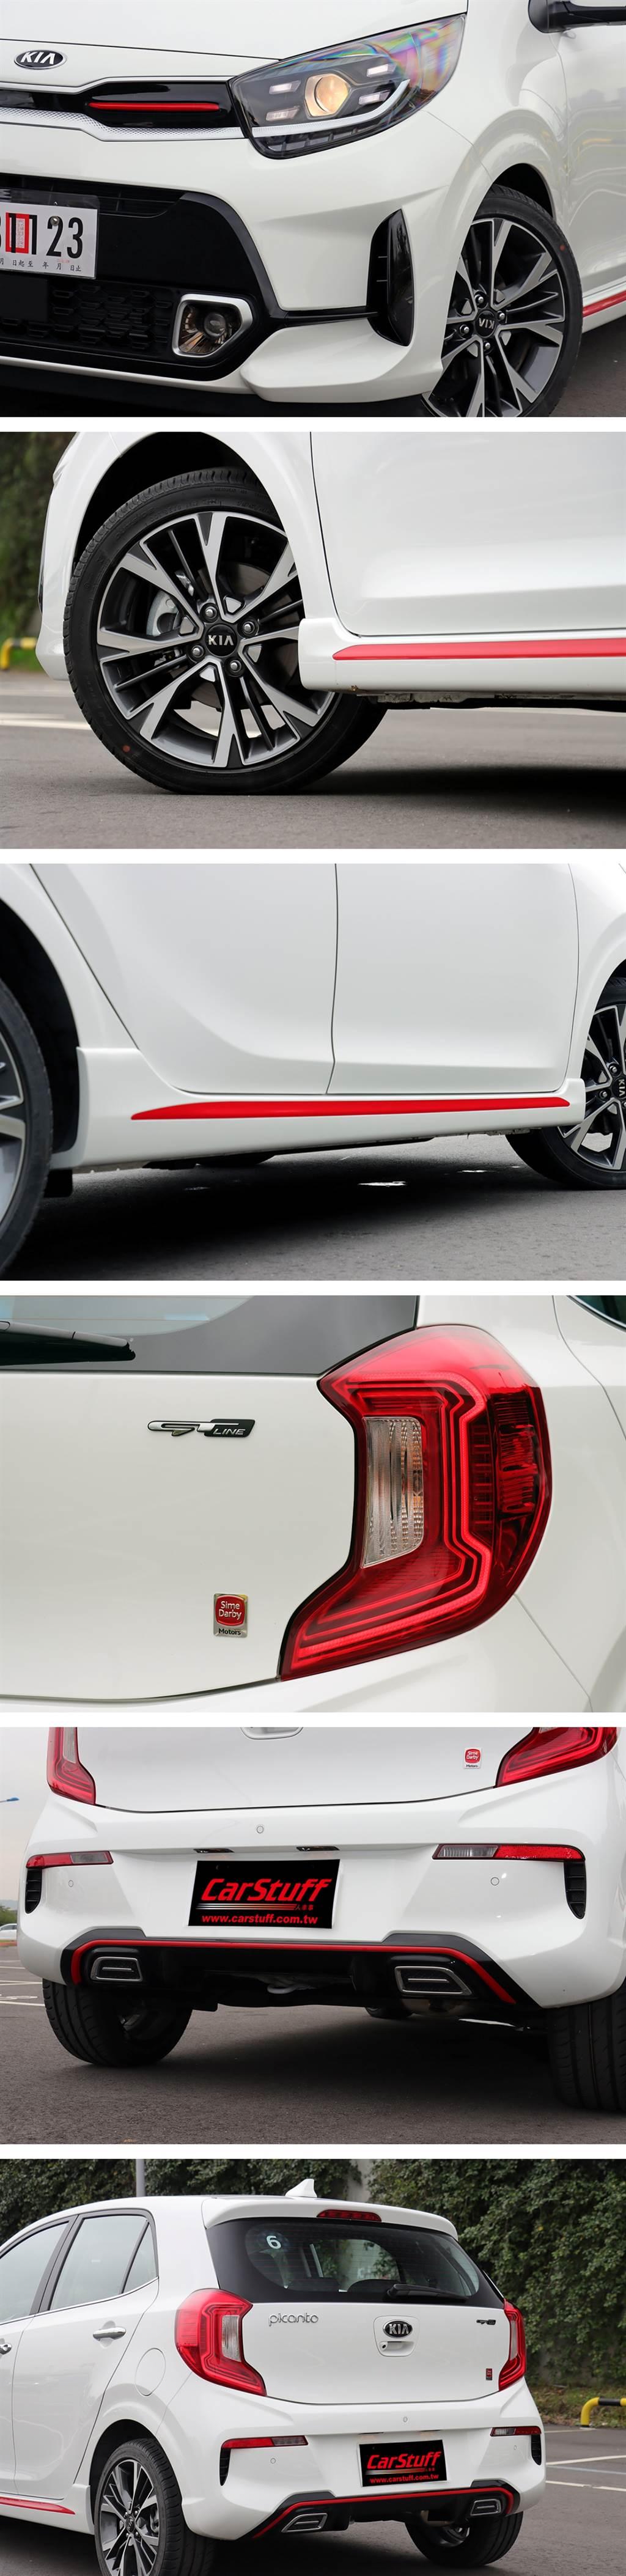 「以小搏大」的實力派小車,2021 KIA Picanto GT-Line 小改款